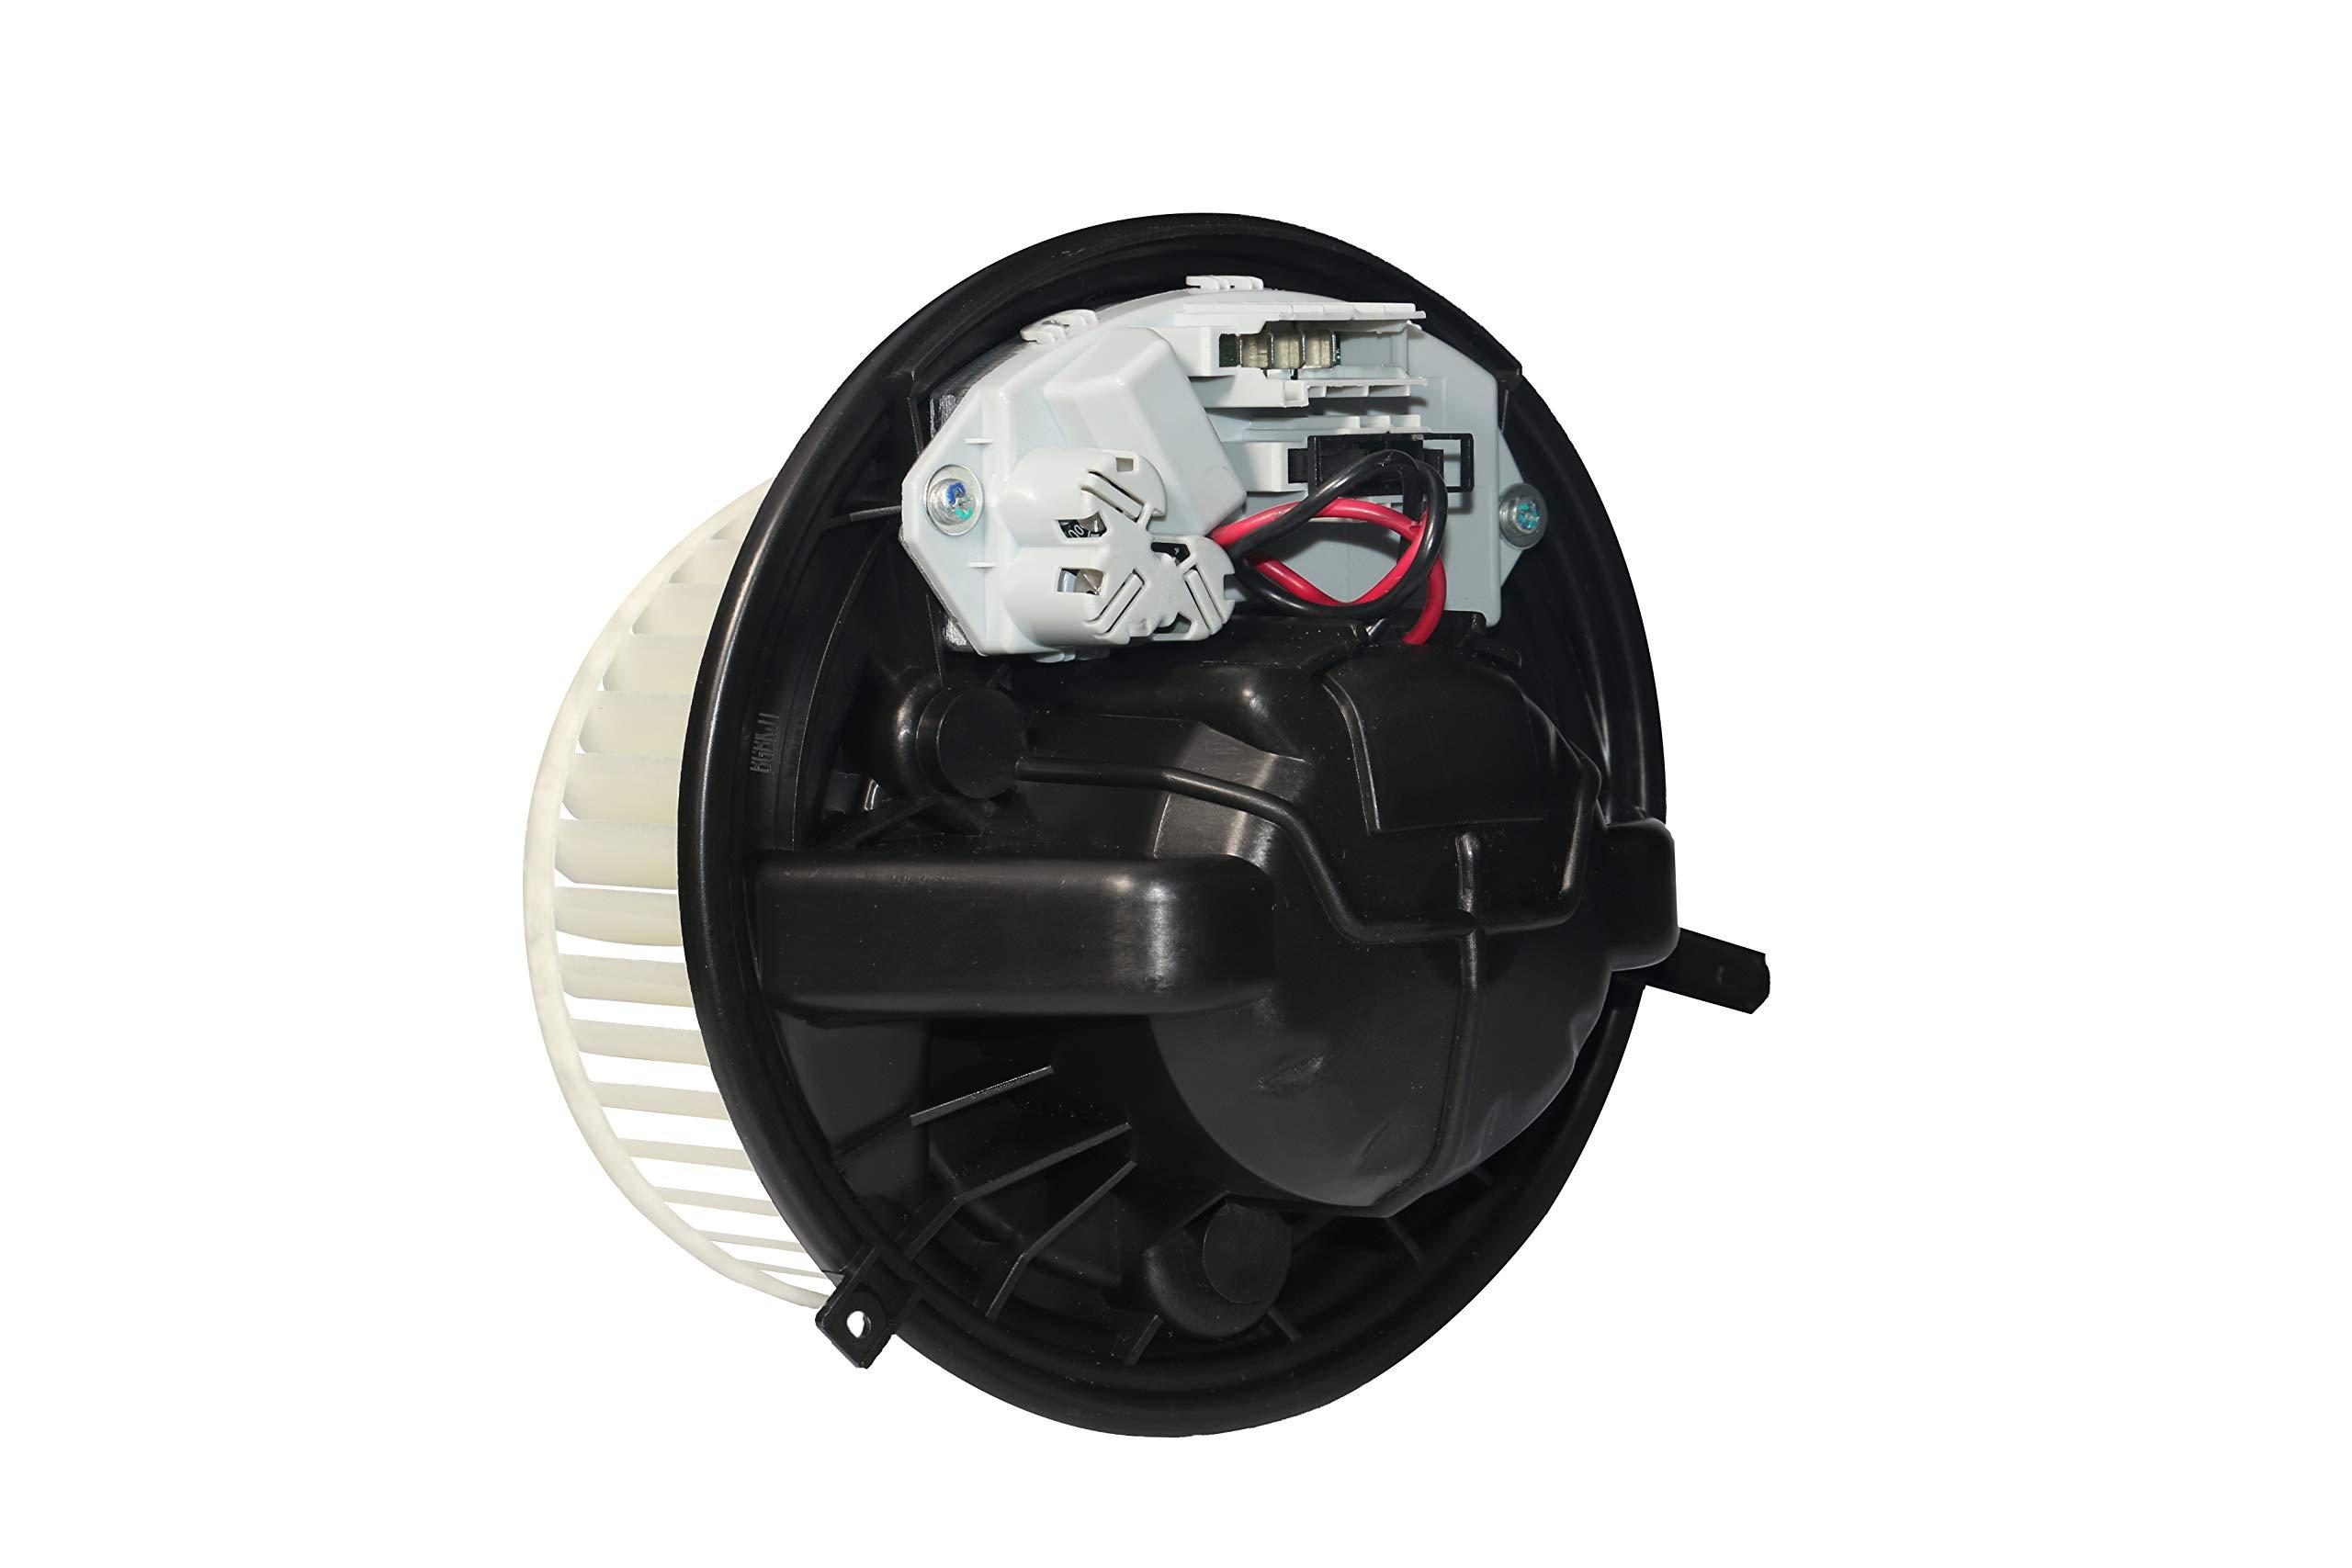 DunGu AC Blower Motor Resistor Kit with Harness Replacements 89019088 973-405 15-81086 22807123 Fits Chevy Silverado Tahoe Suburban Avalanche GMC Sierra Yukon Escalade HVAC Fan Auto Parts